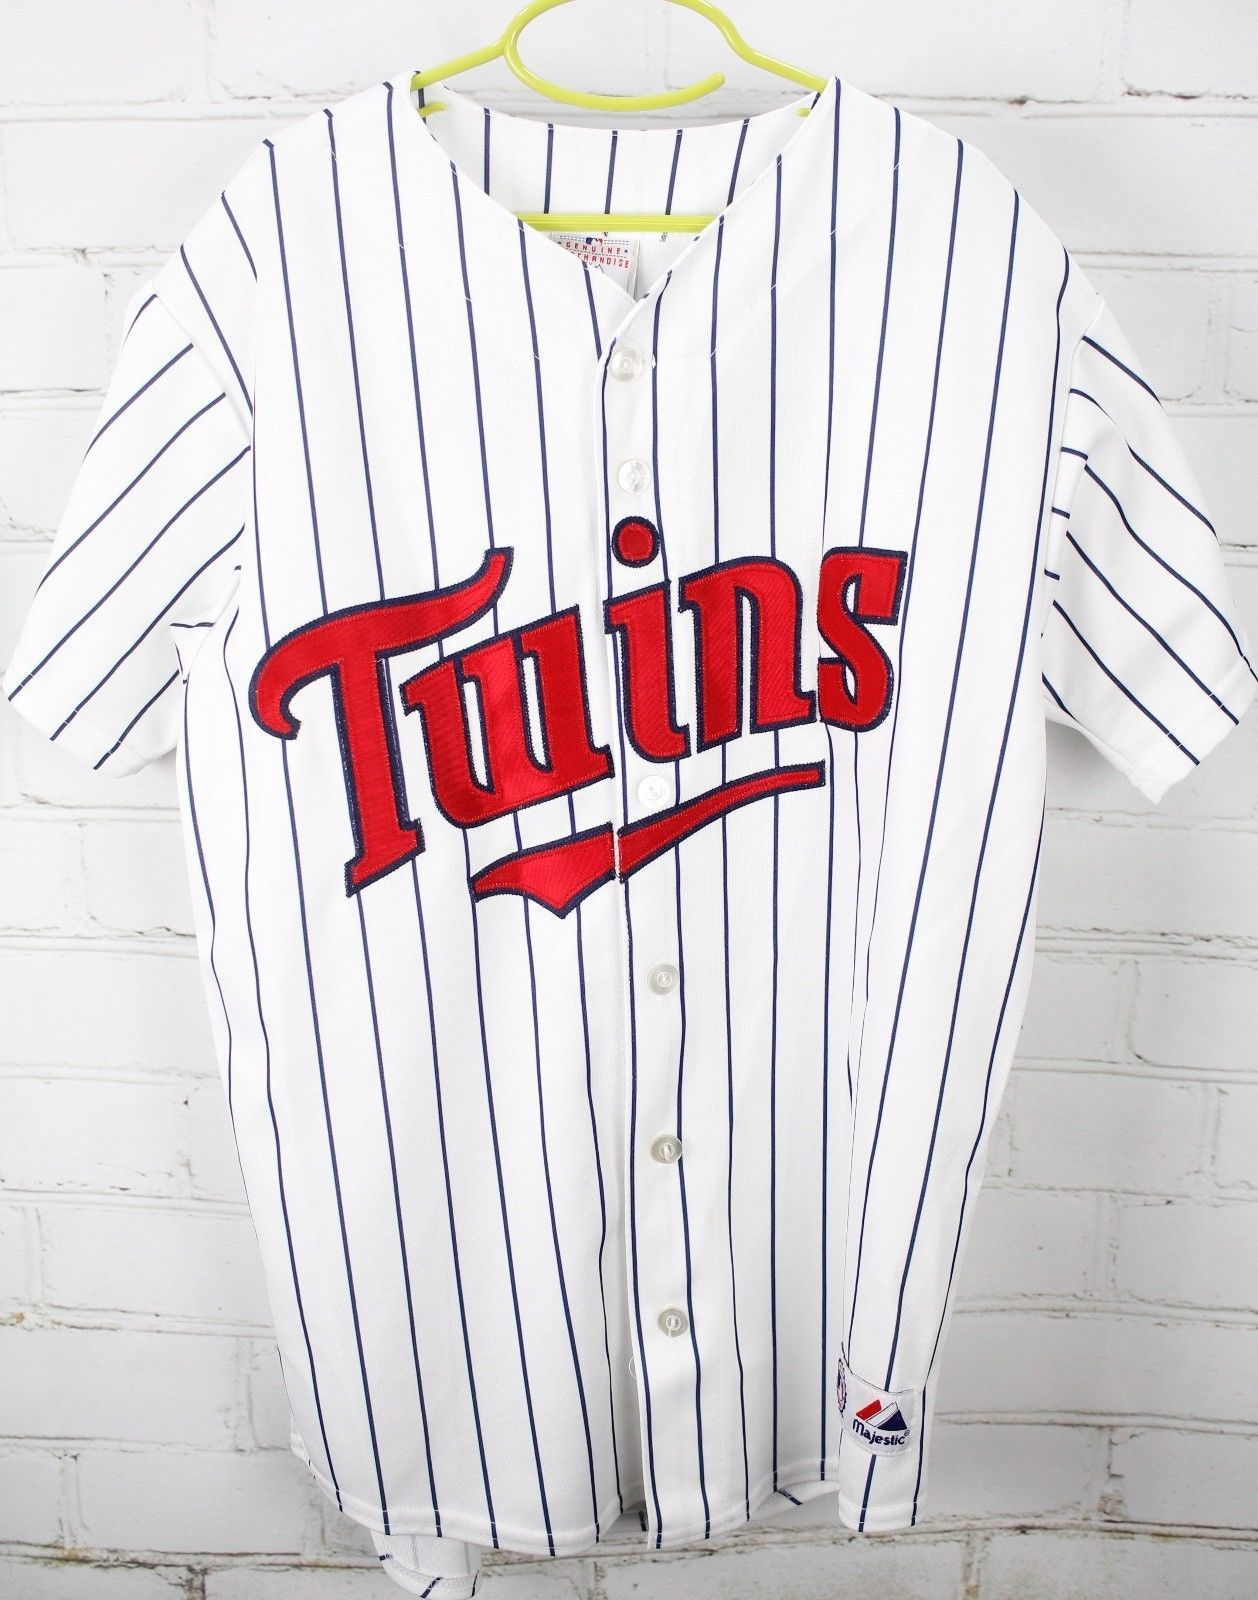 e7075c77 57. 57. Previous. Minnesota Twins Joe Mauer 7 Short Sleeve Baseball Jersey  Youth Boy's L Large MLB